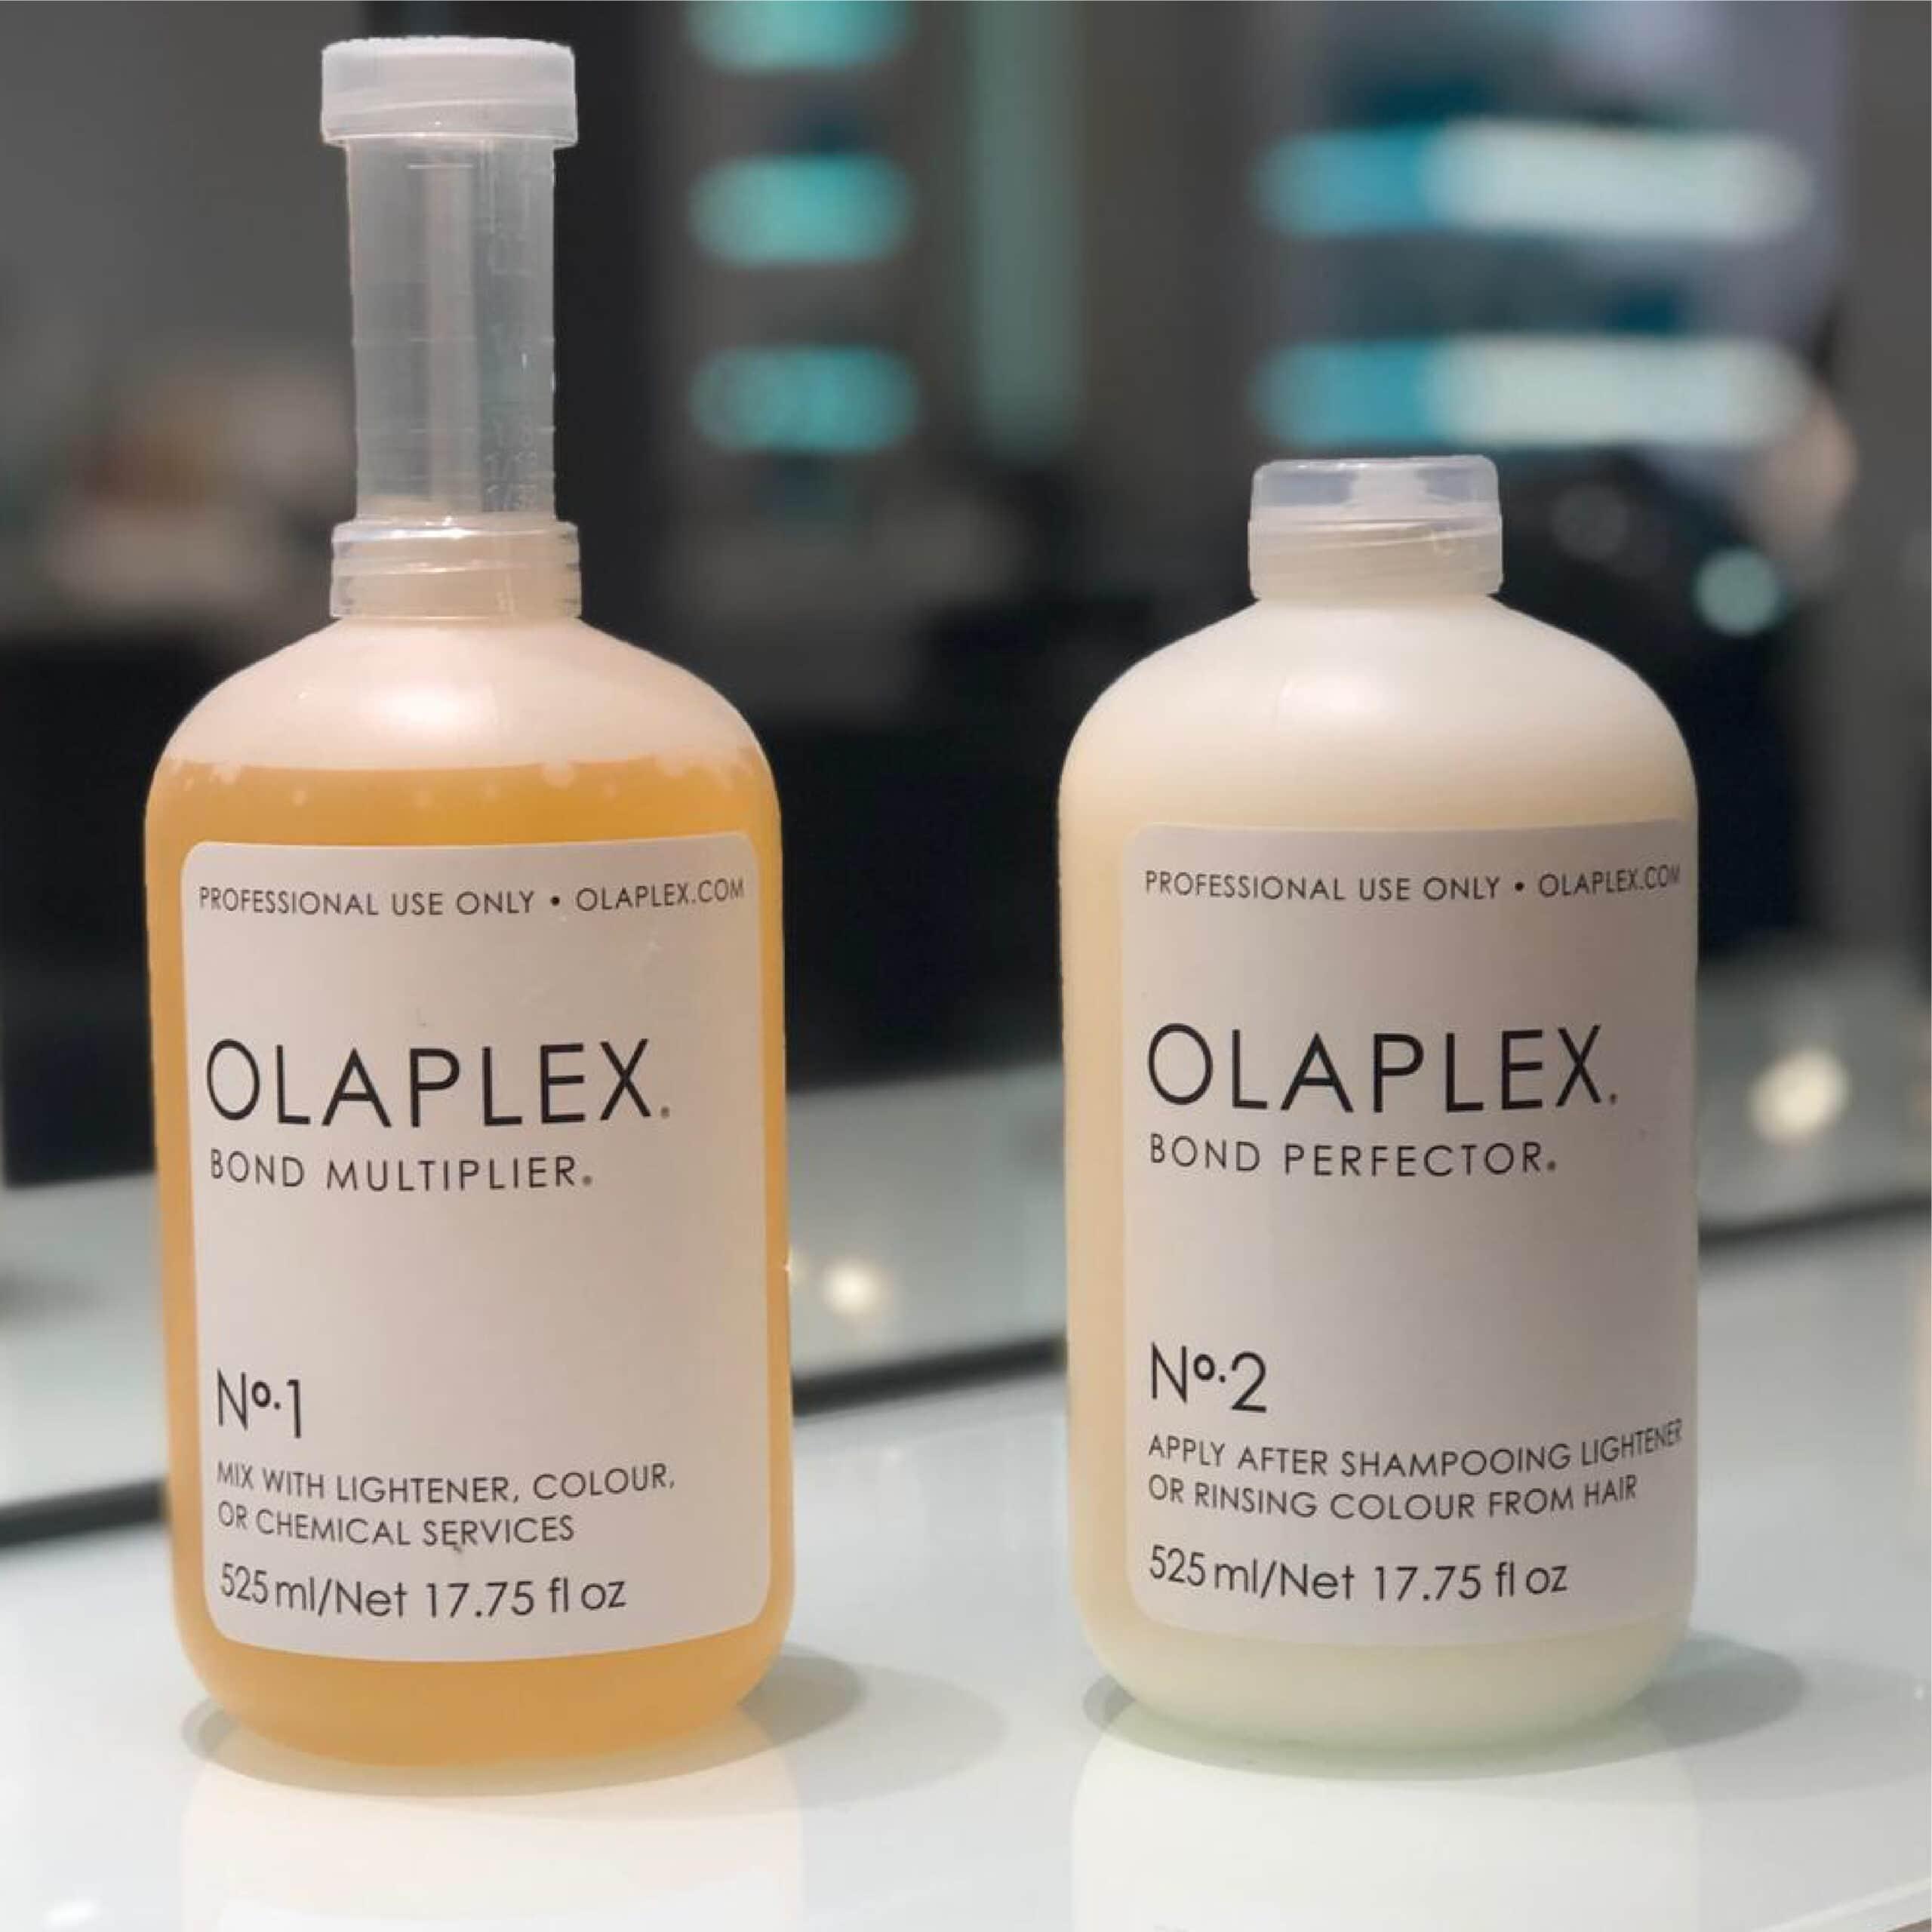 Olaplex för salongsbruk